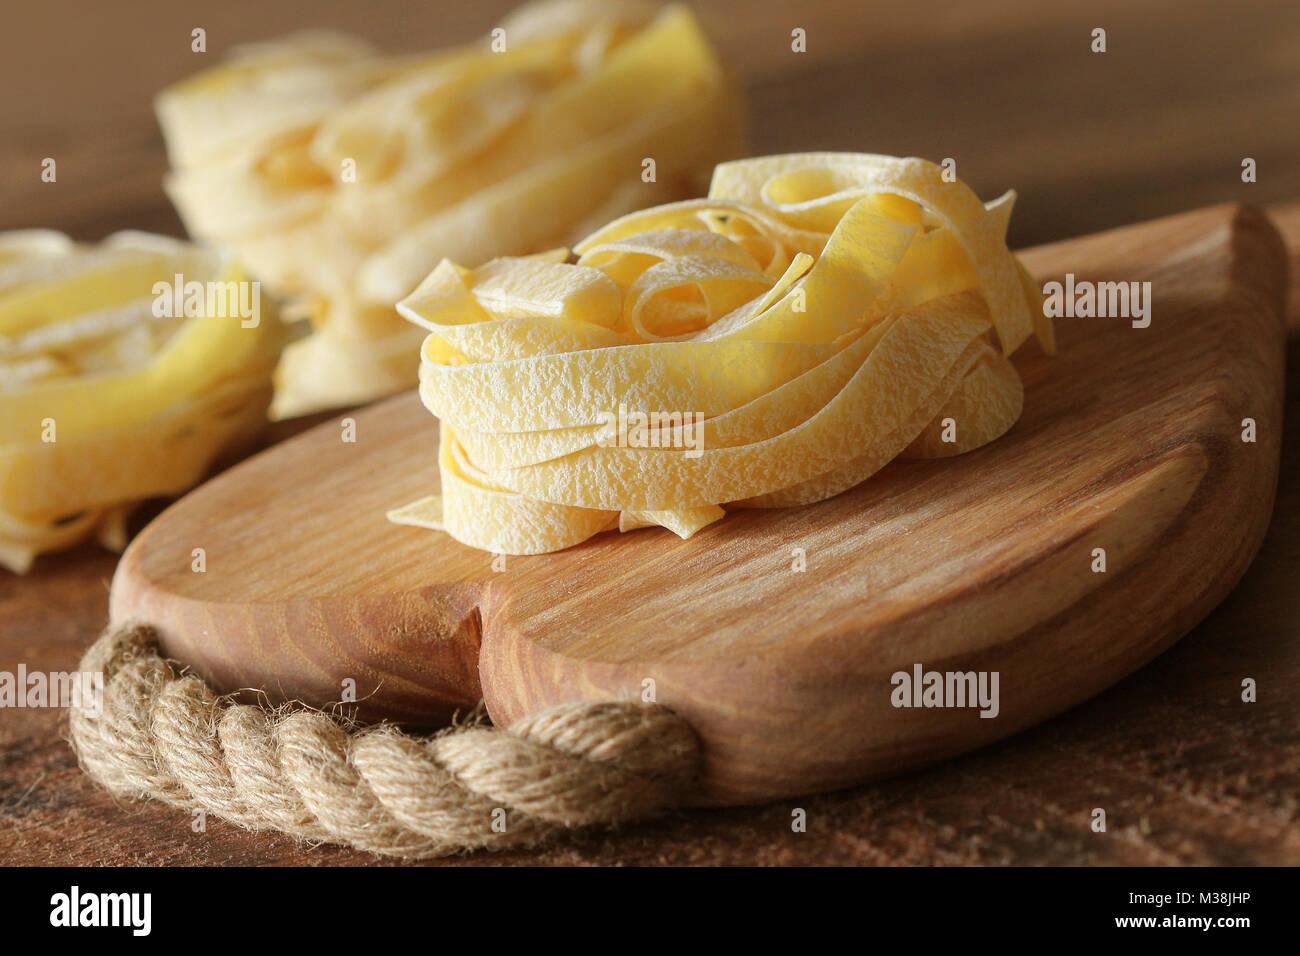 Nest von Pasta tagliatelle auf Holz Schneidebrett aon rustikalen Hintergrund. Selektiver Fokus Stockbild